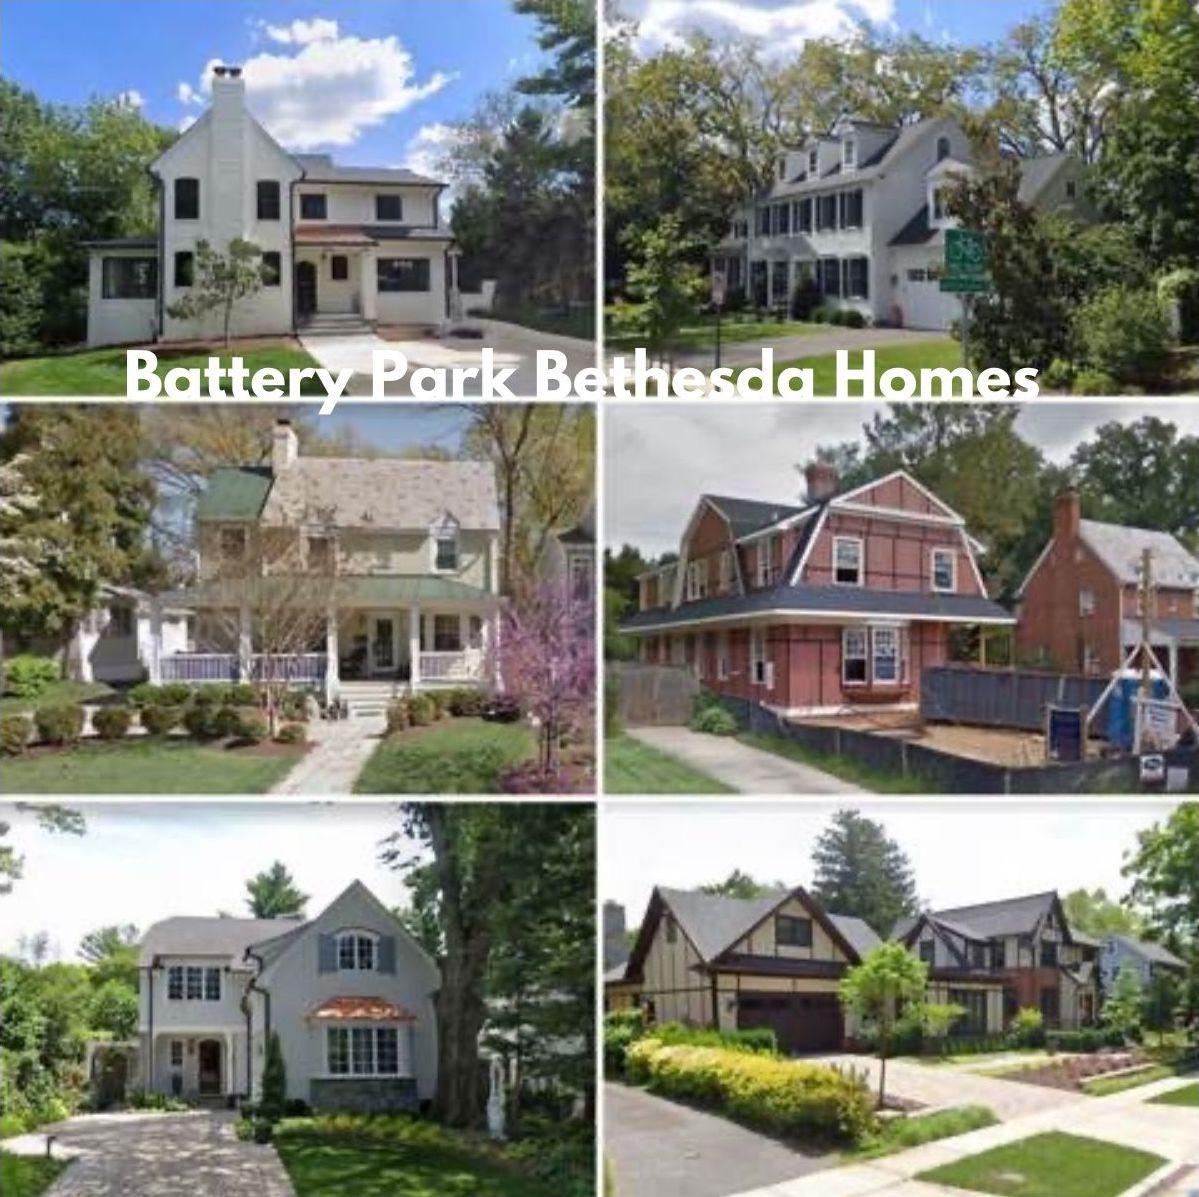 Battery Park Bethesda Homes Guide - KoitzGroup